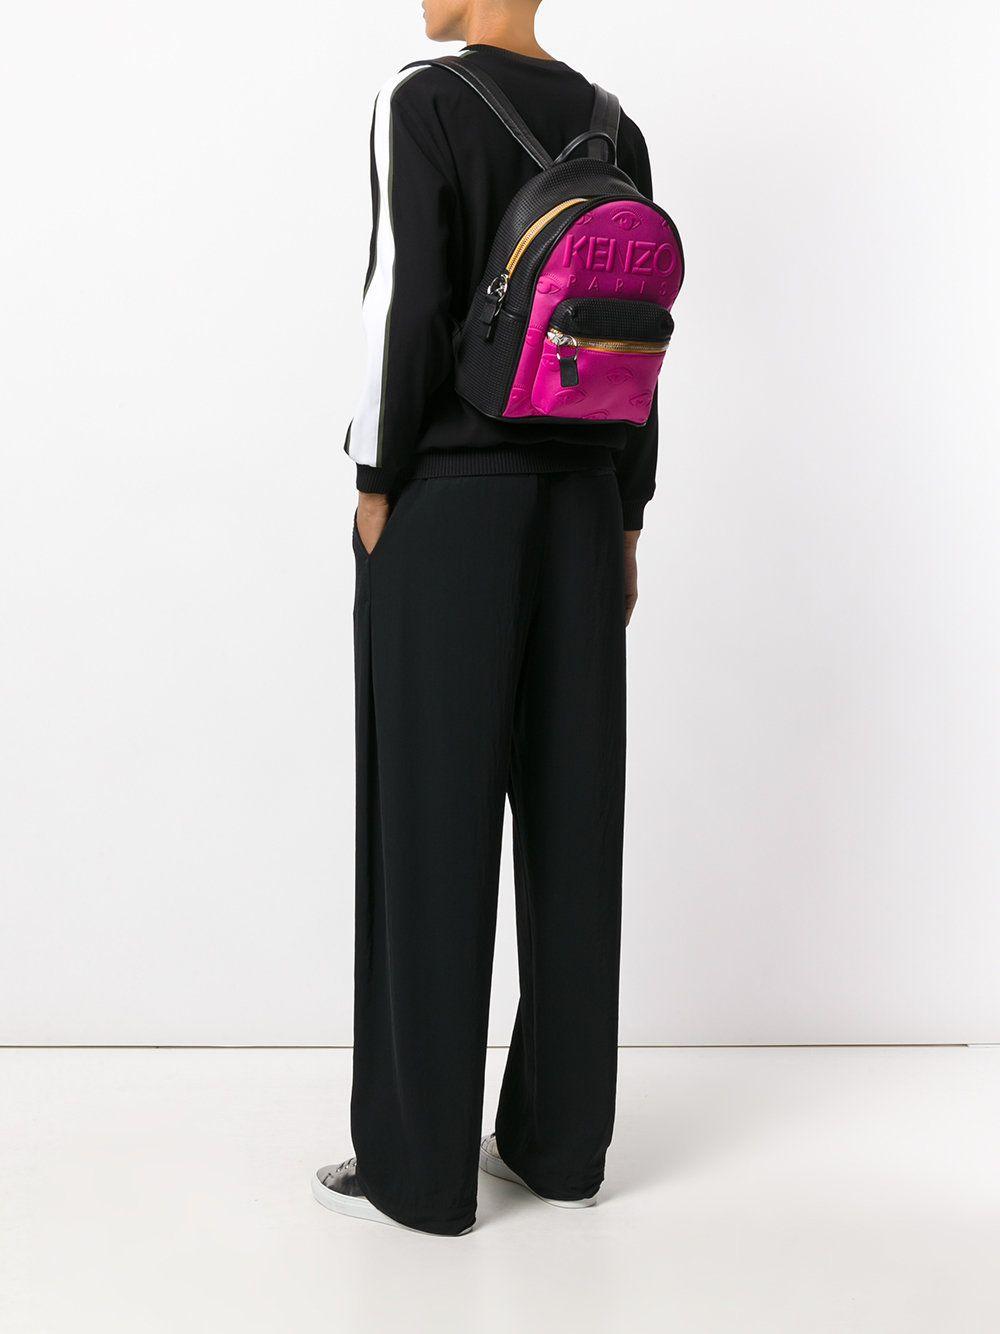 KENZO Backpacks Casual Style Unisex A4 Backpacks 2 353473b5297c5